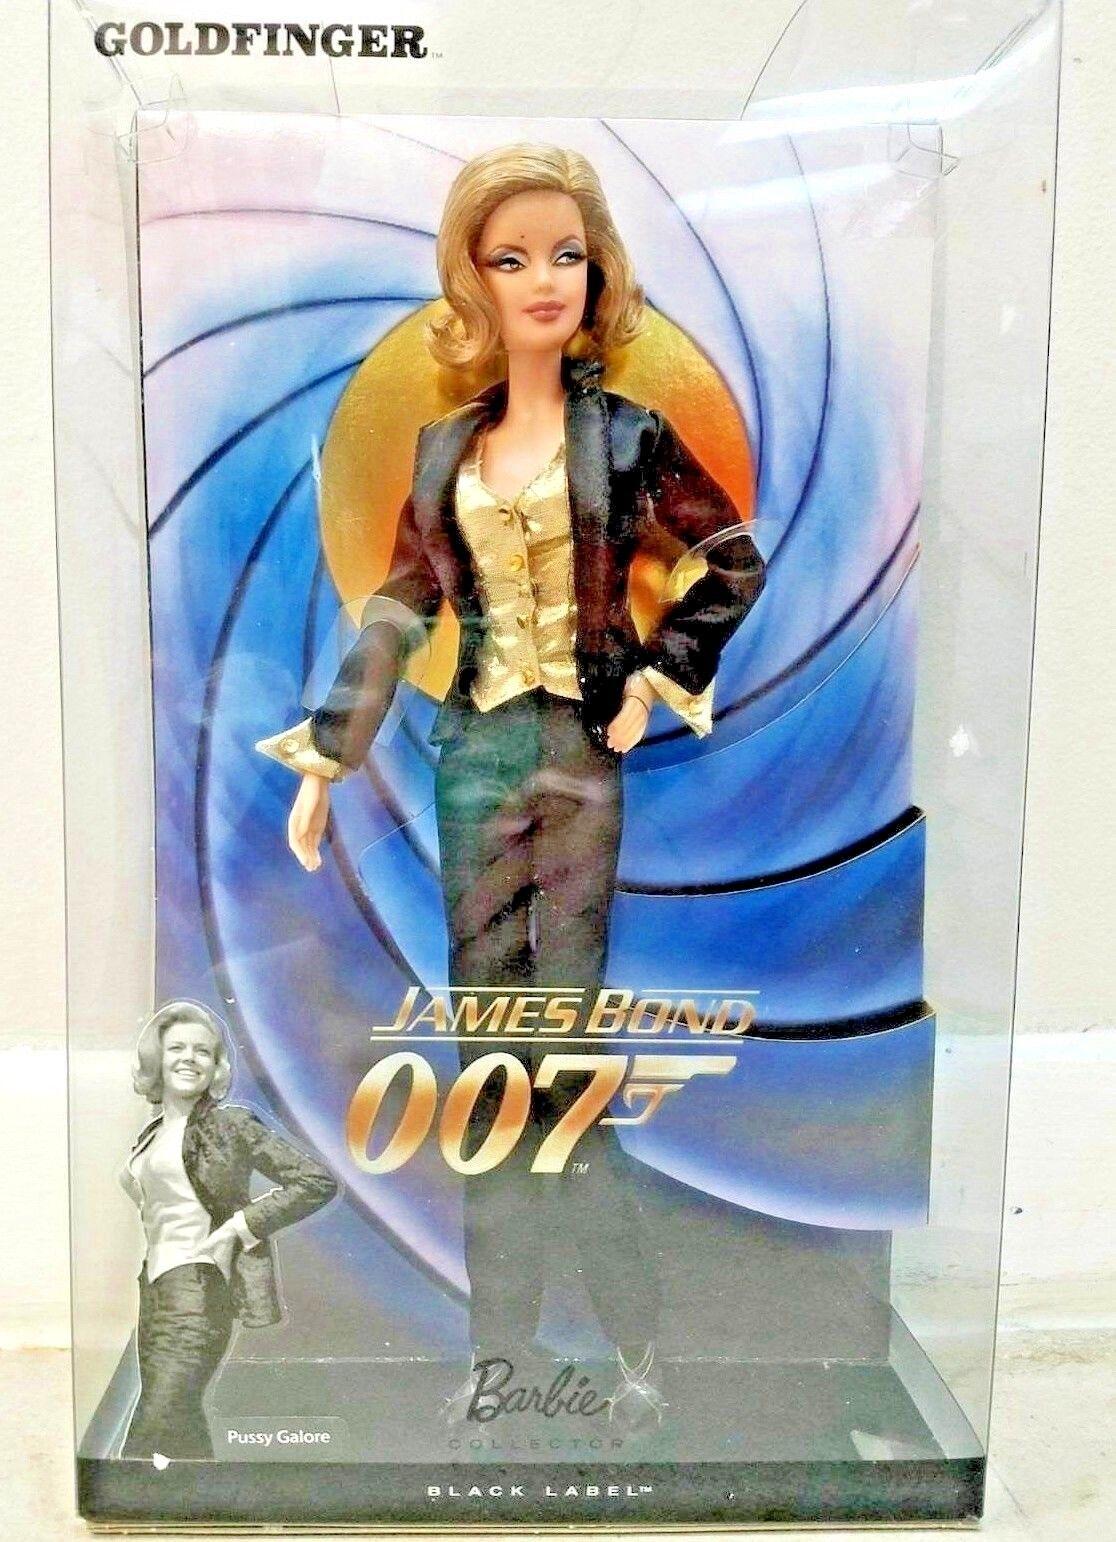 BARBIE JAMES BOND 007 oroFINGER NRFB - negro LABEL new model muse doll Mattel